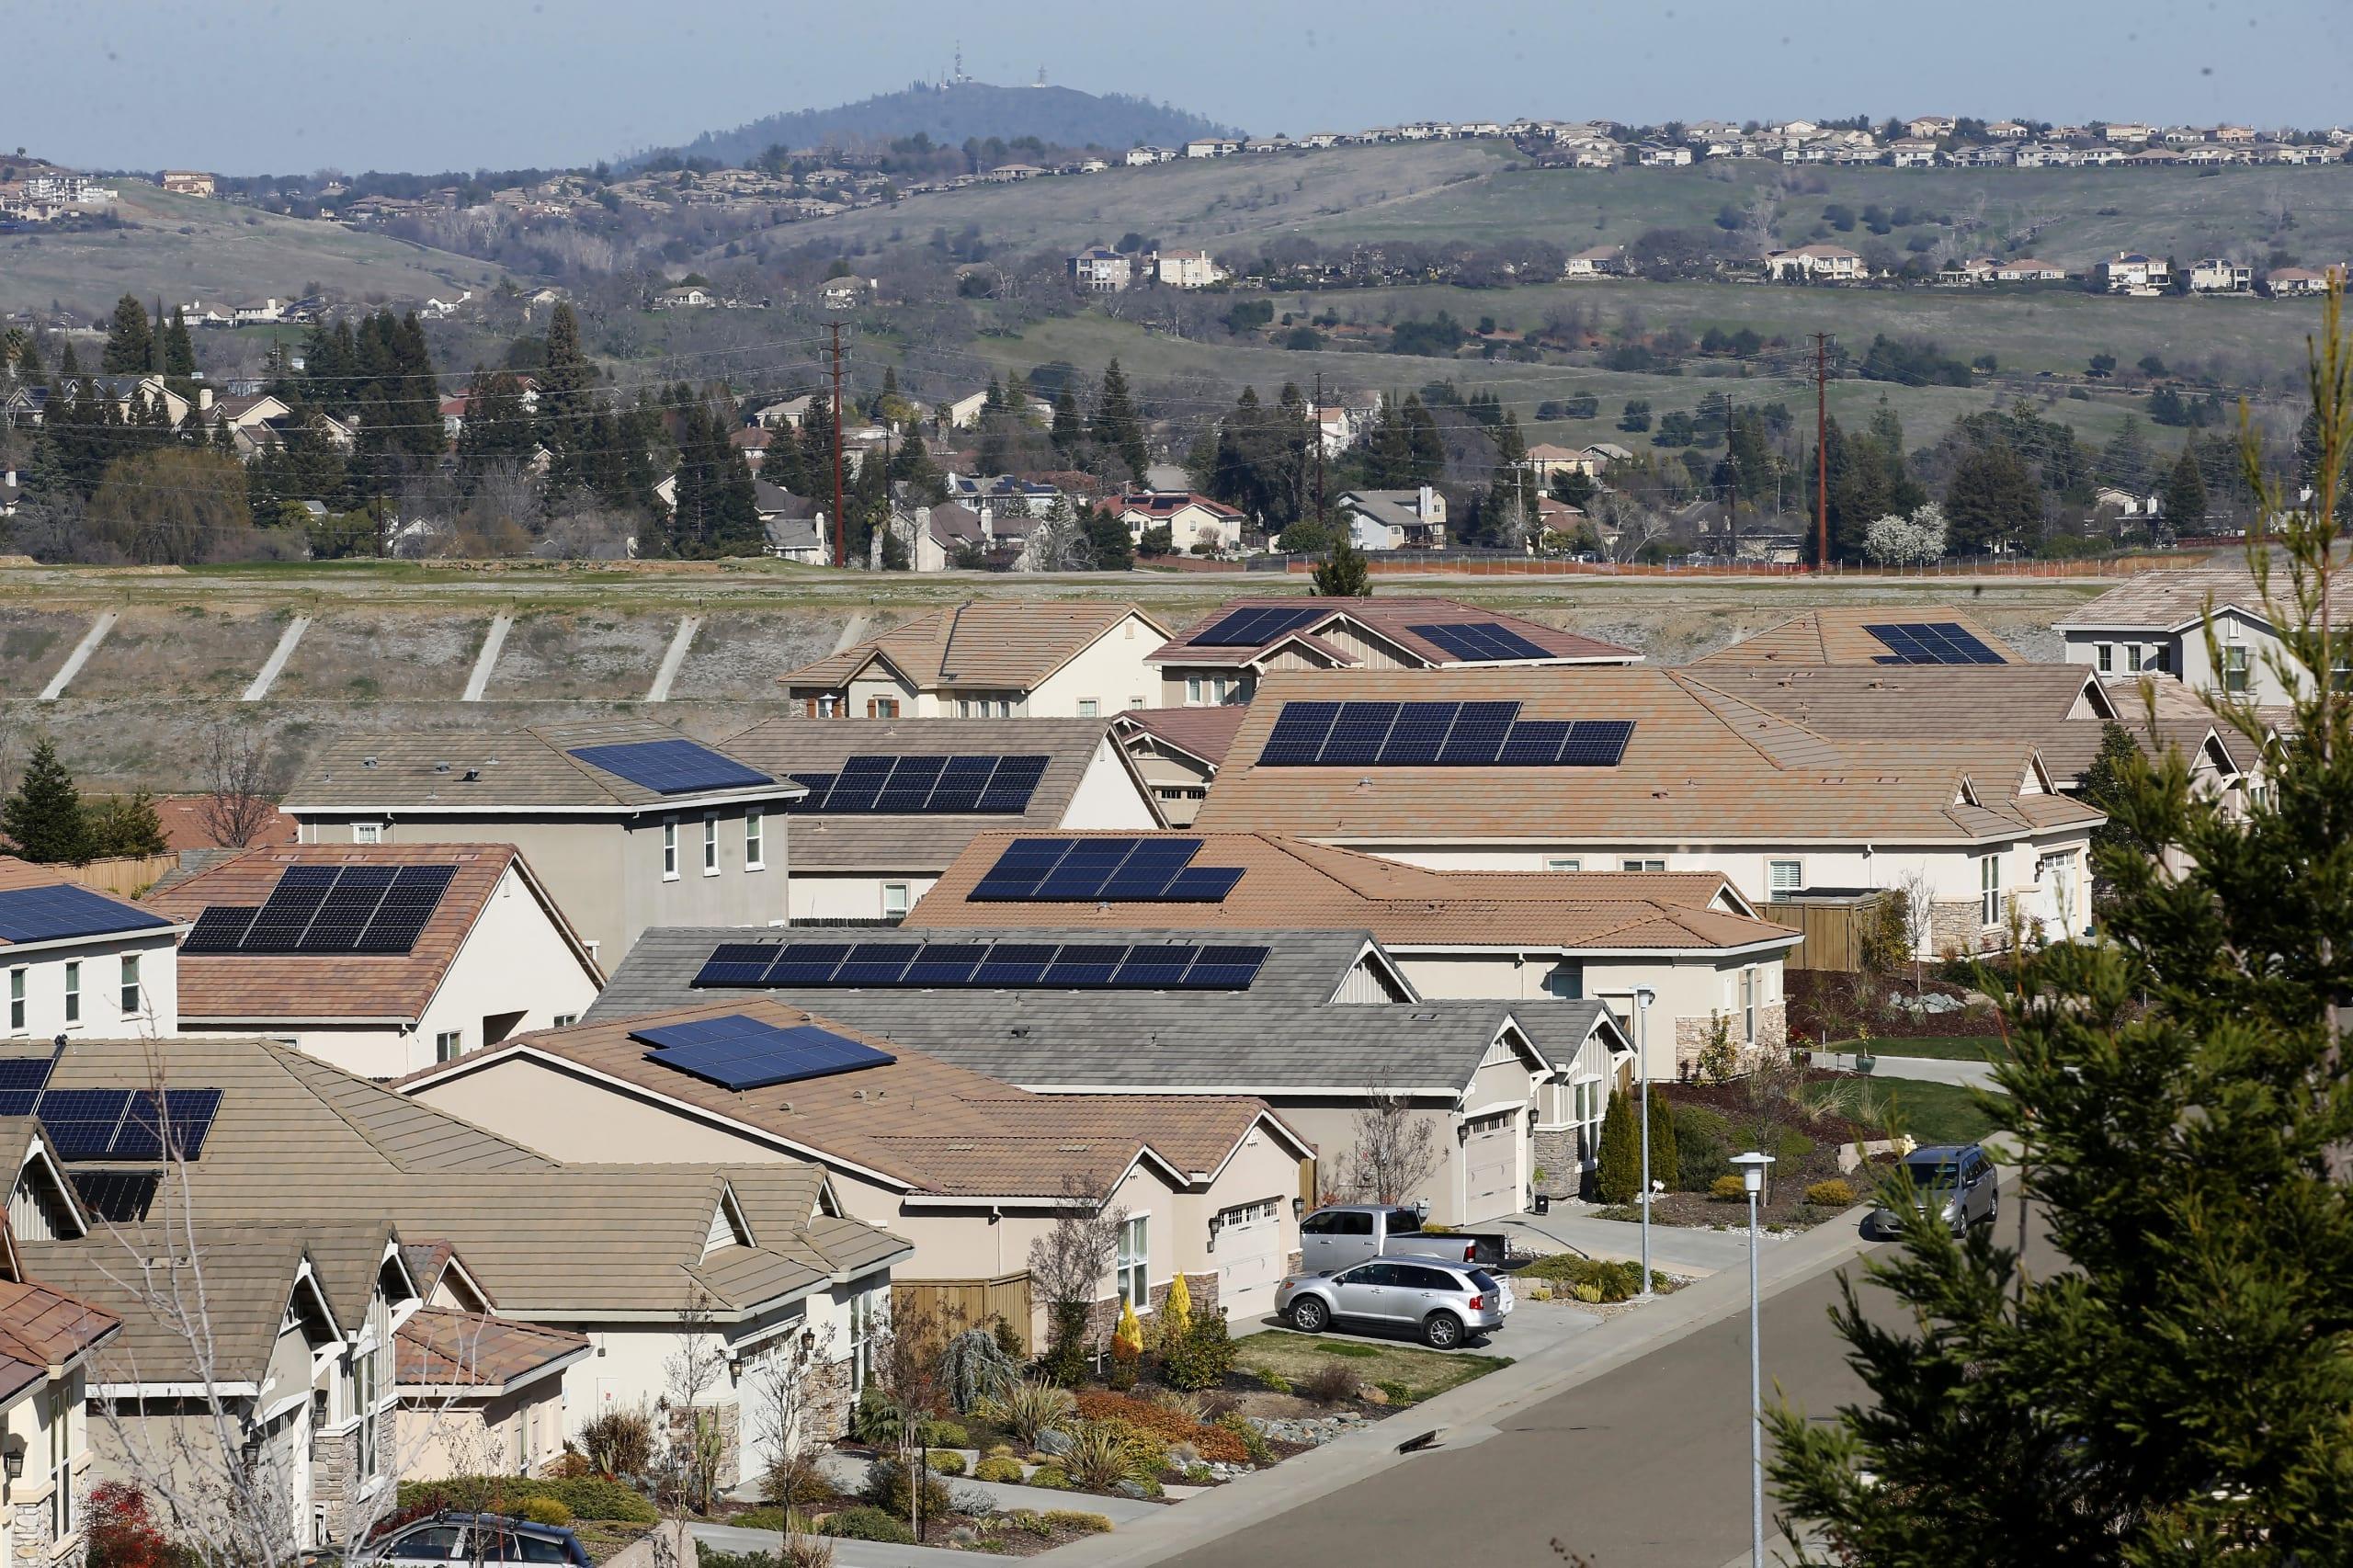 Silicon Valley Community Foundation photo